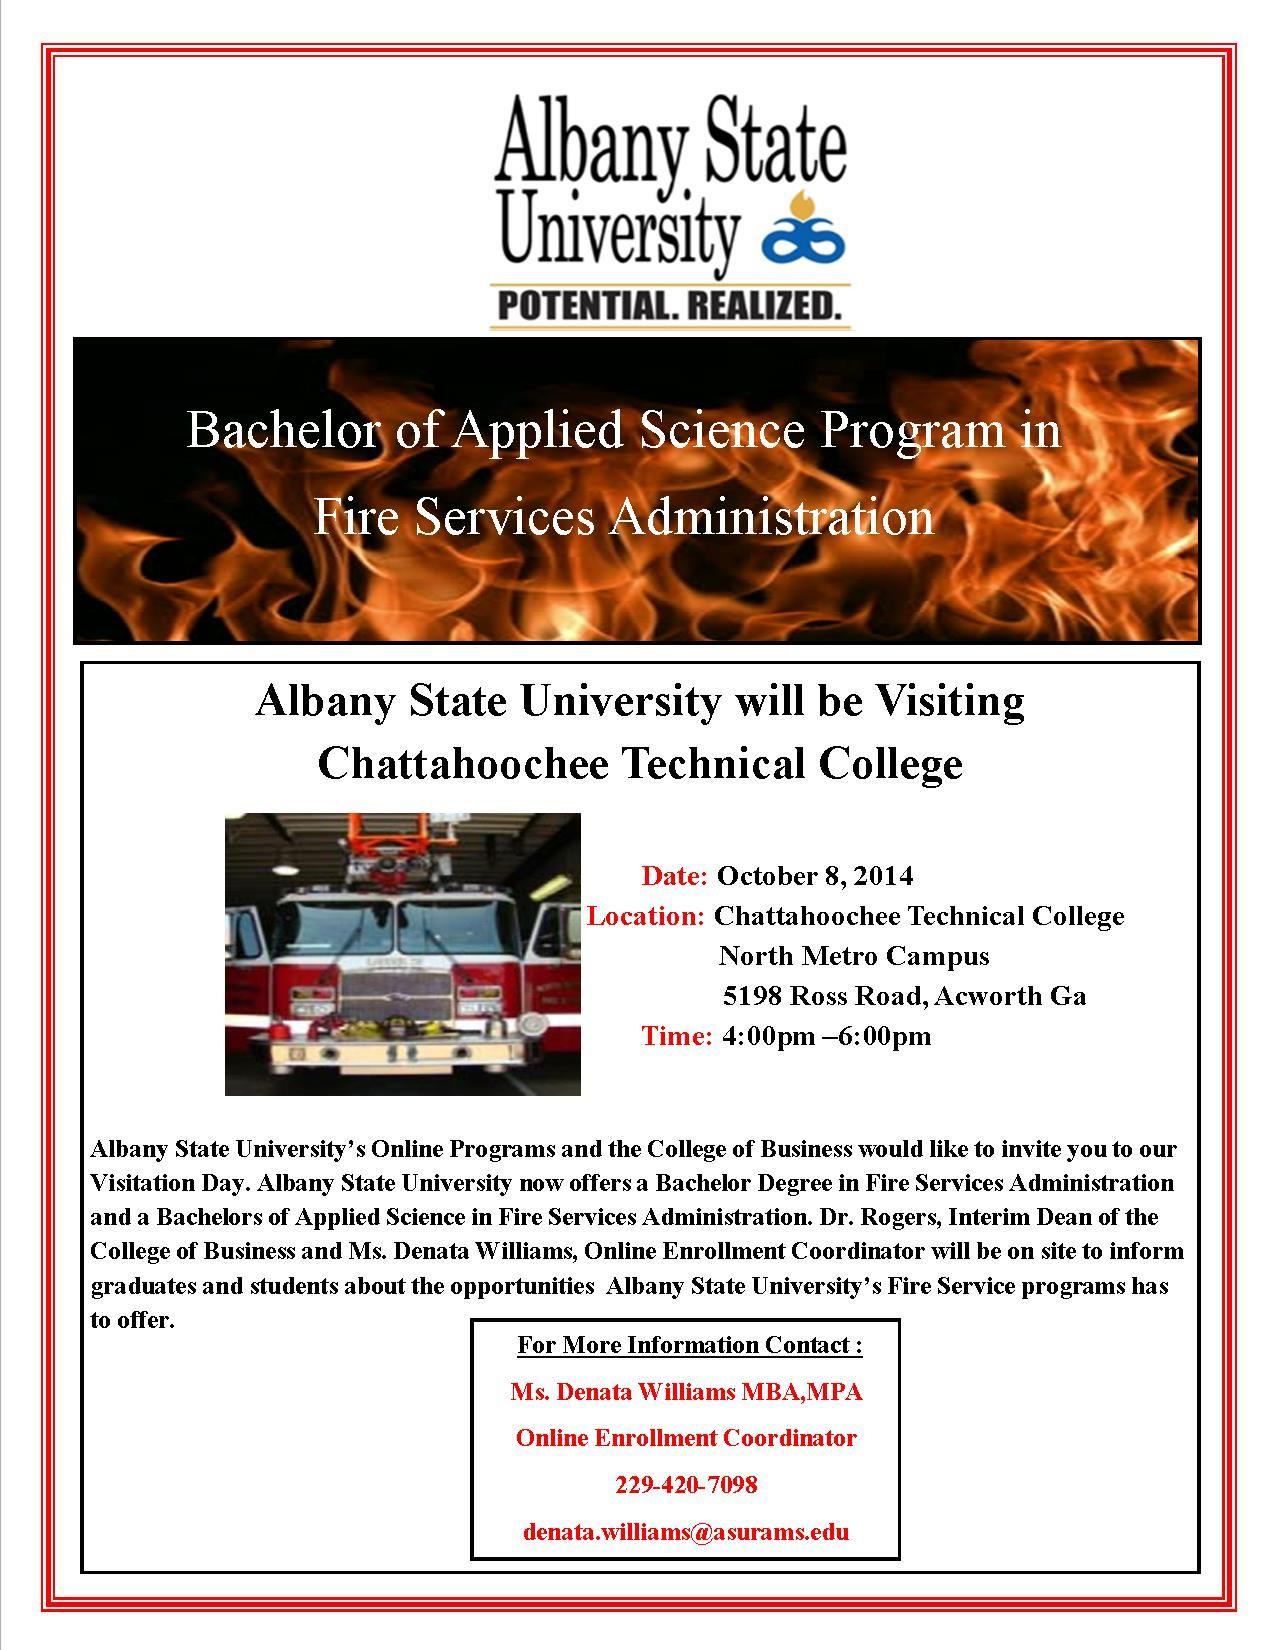 Albany state university is visiting chattahoochee